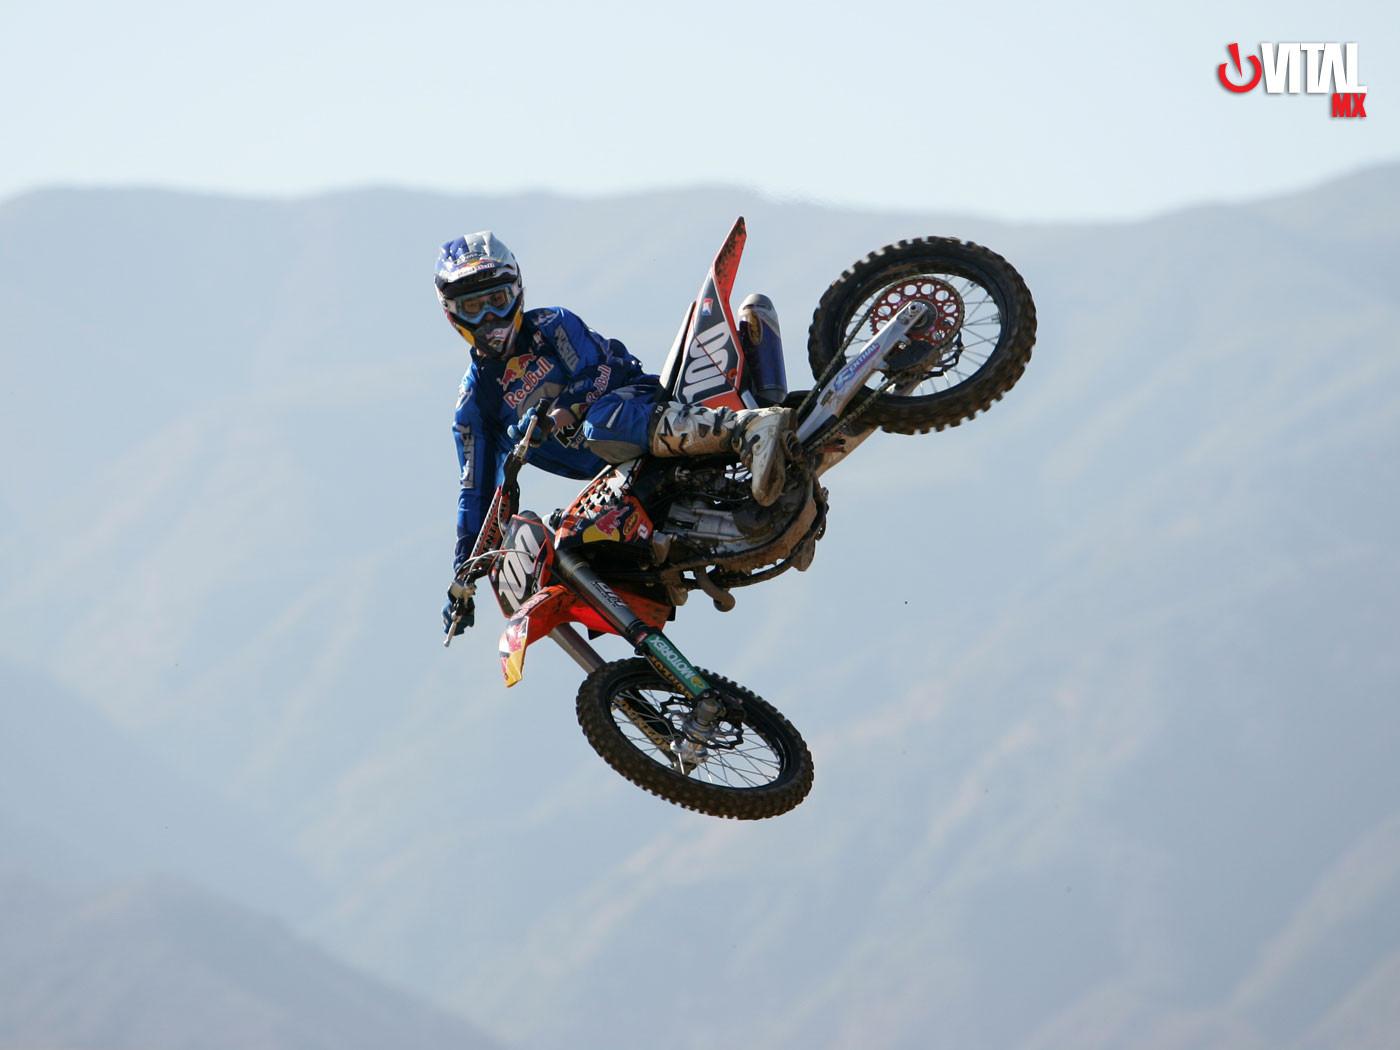 Josh Hansen 1400 x 1050 - 2006 Hot Shots: Josh Hansen 12/20/06 - Motocross Pictures - Vital MX